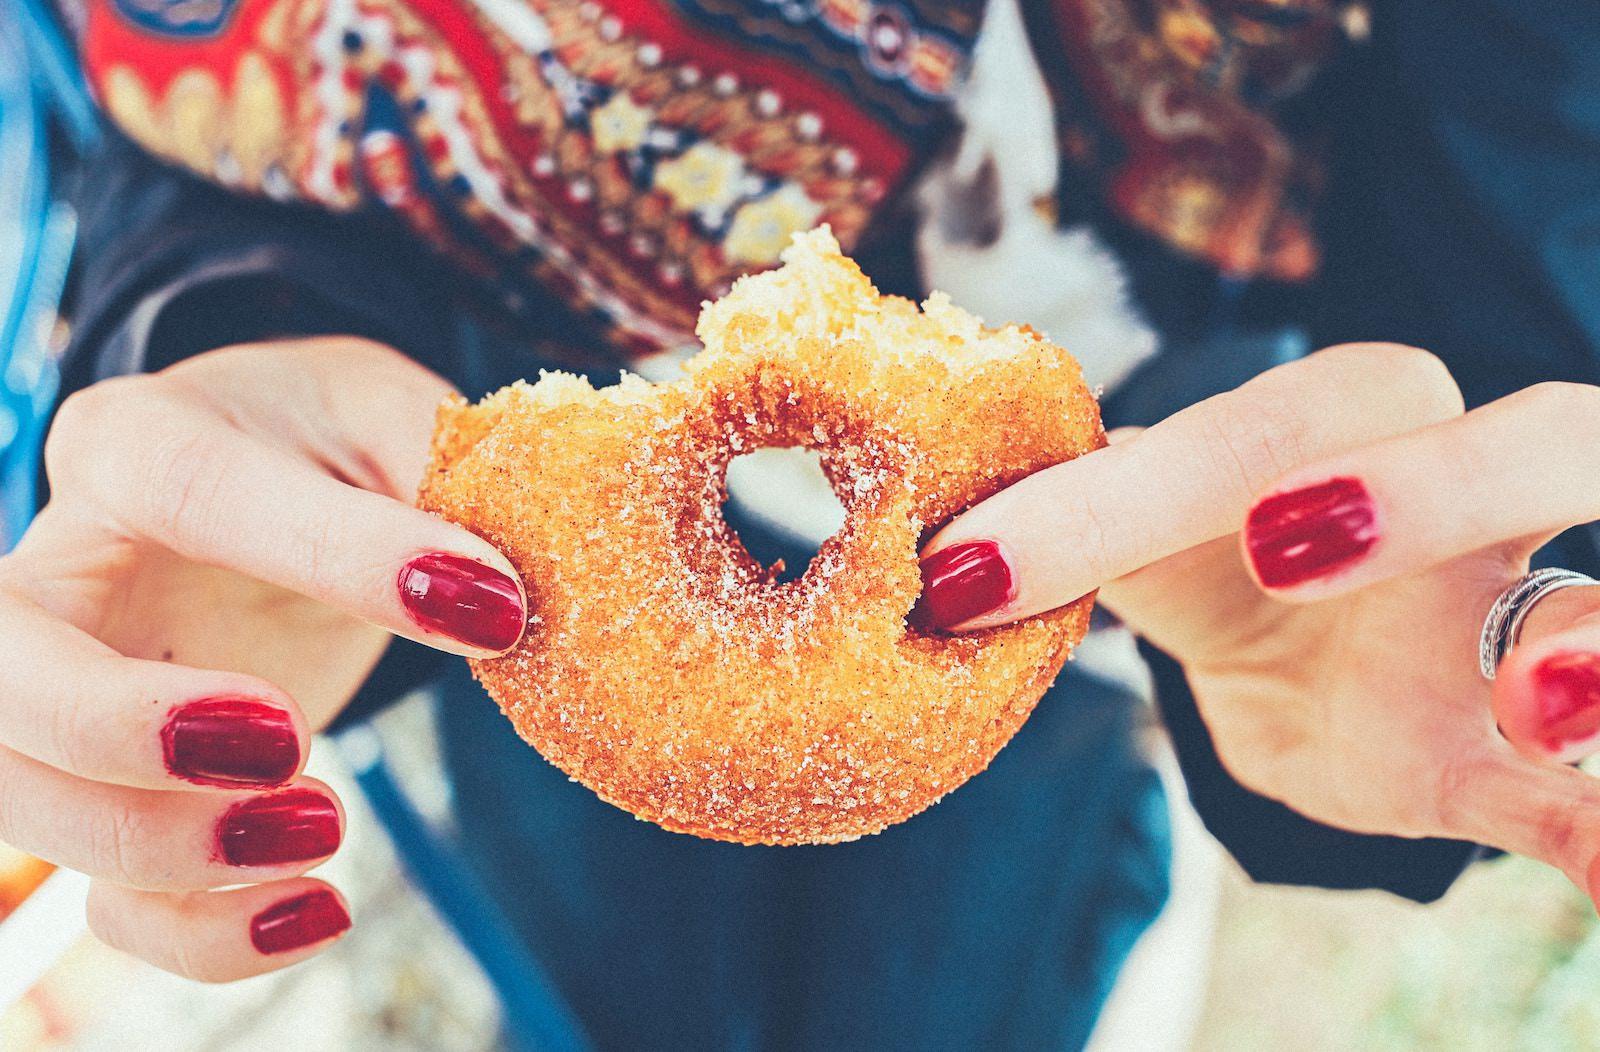 thomas-kelley-77413-unsplash-eaten-doughnuts.jpg